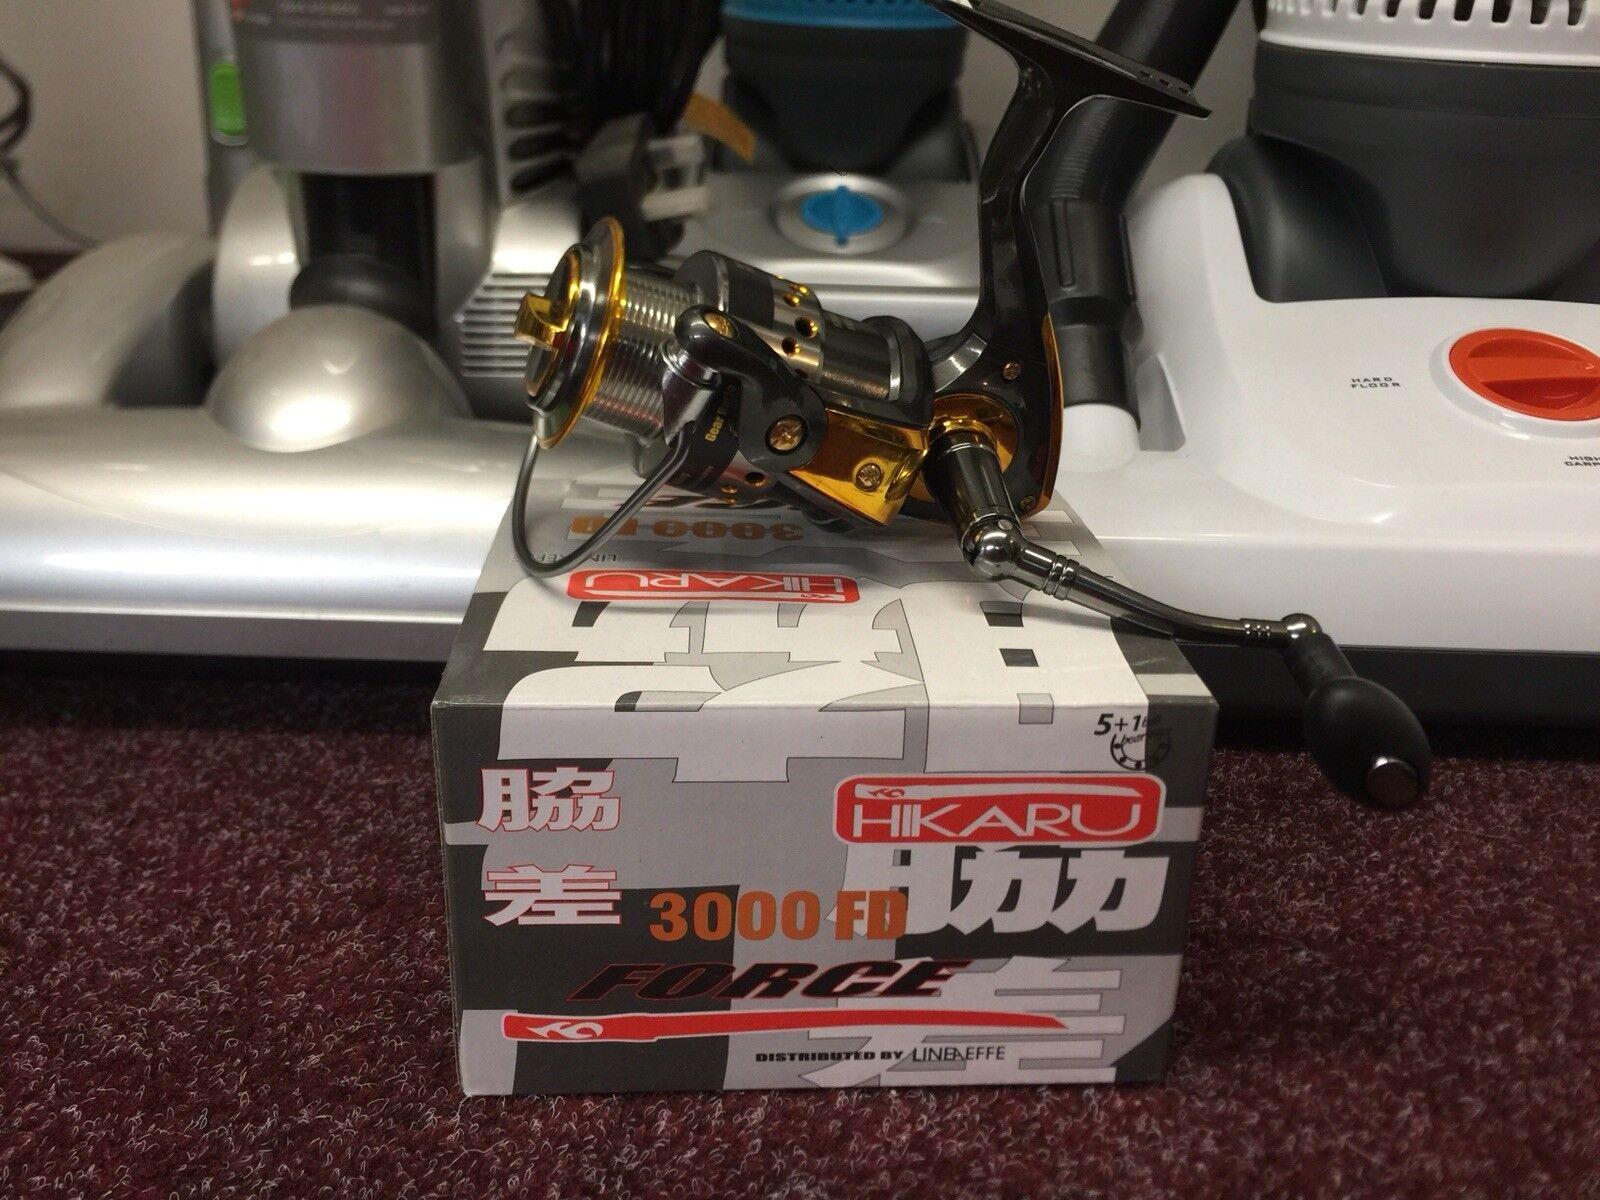 Hikaru 3000 FD Force Fixed Spool Reel